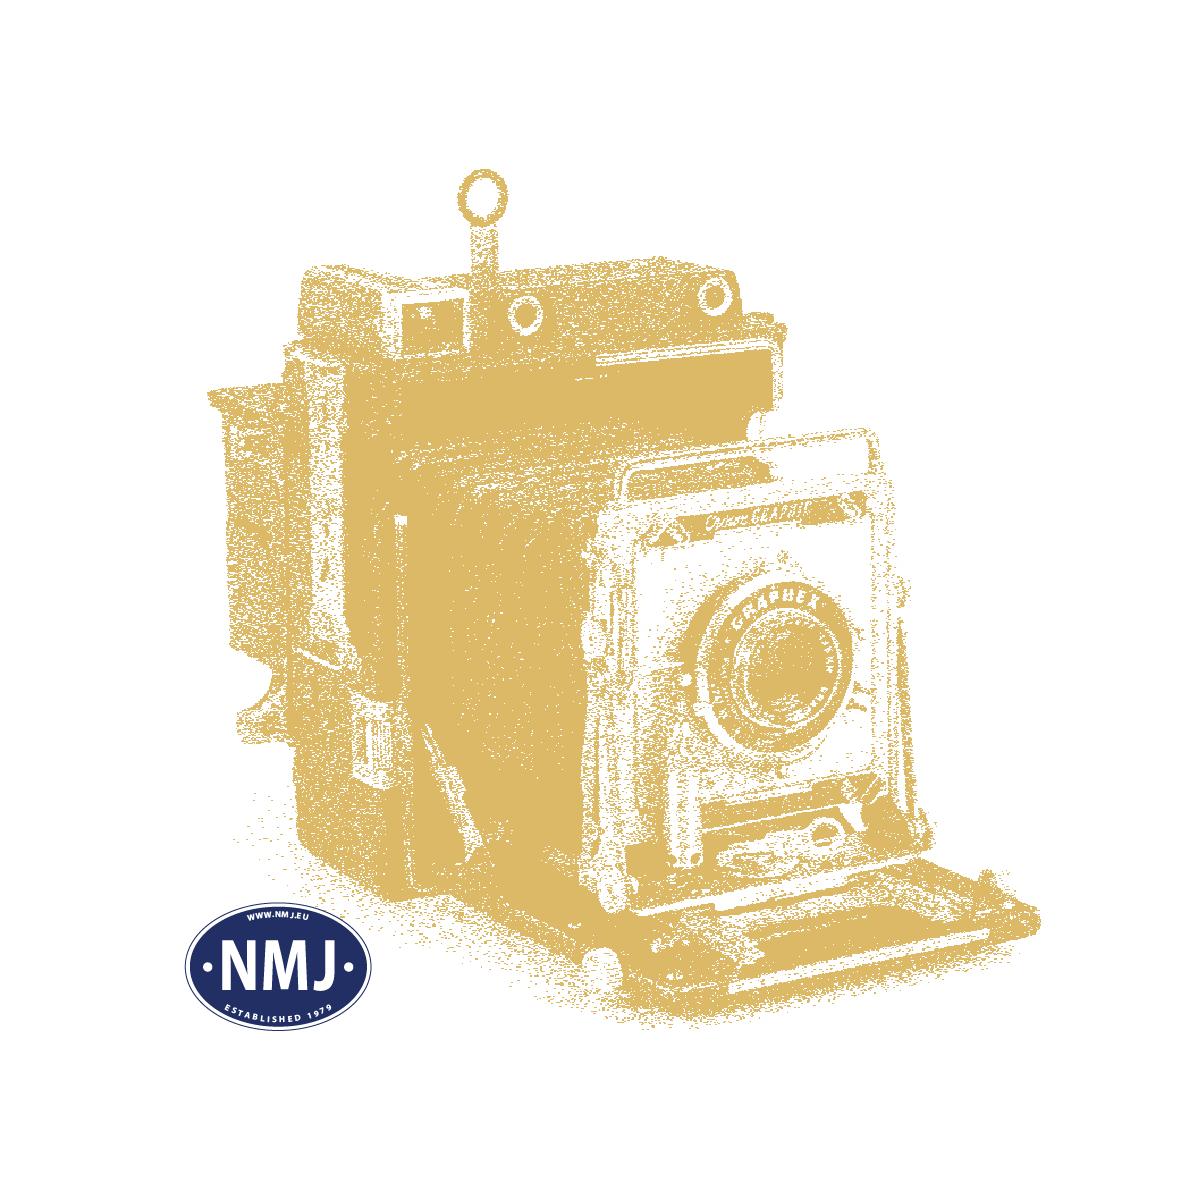 NMJT81.992 - NMJ Topline Interiørlys for BM73, 4 Deler, DC/DCC